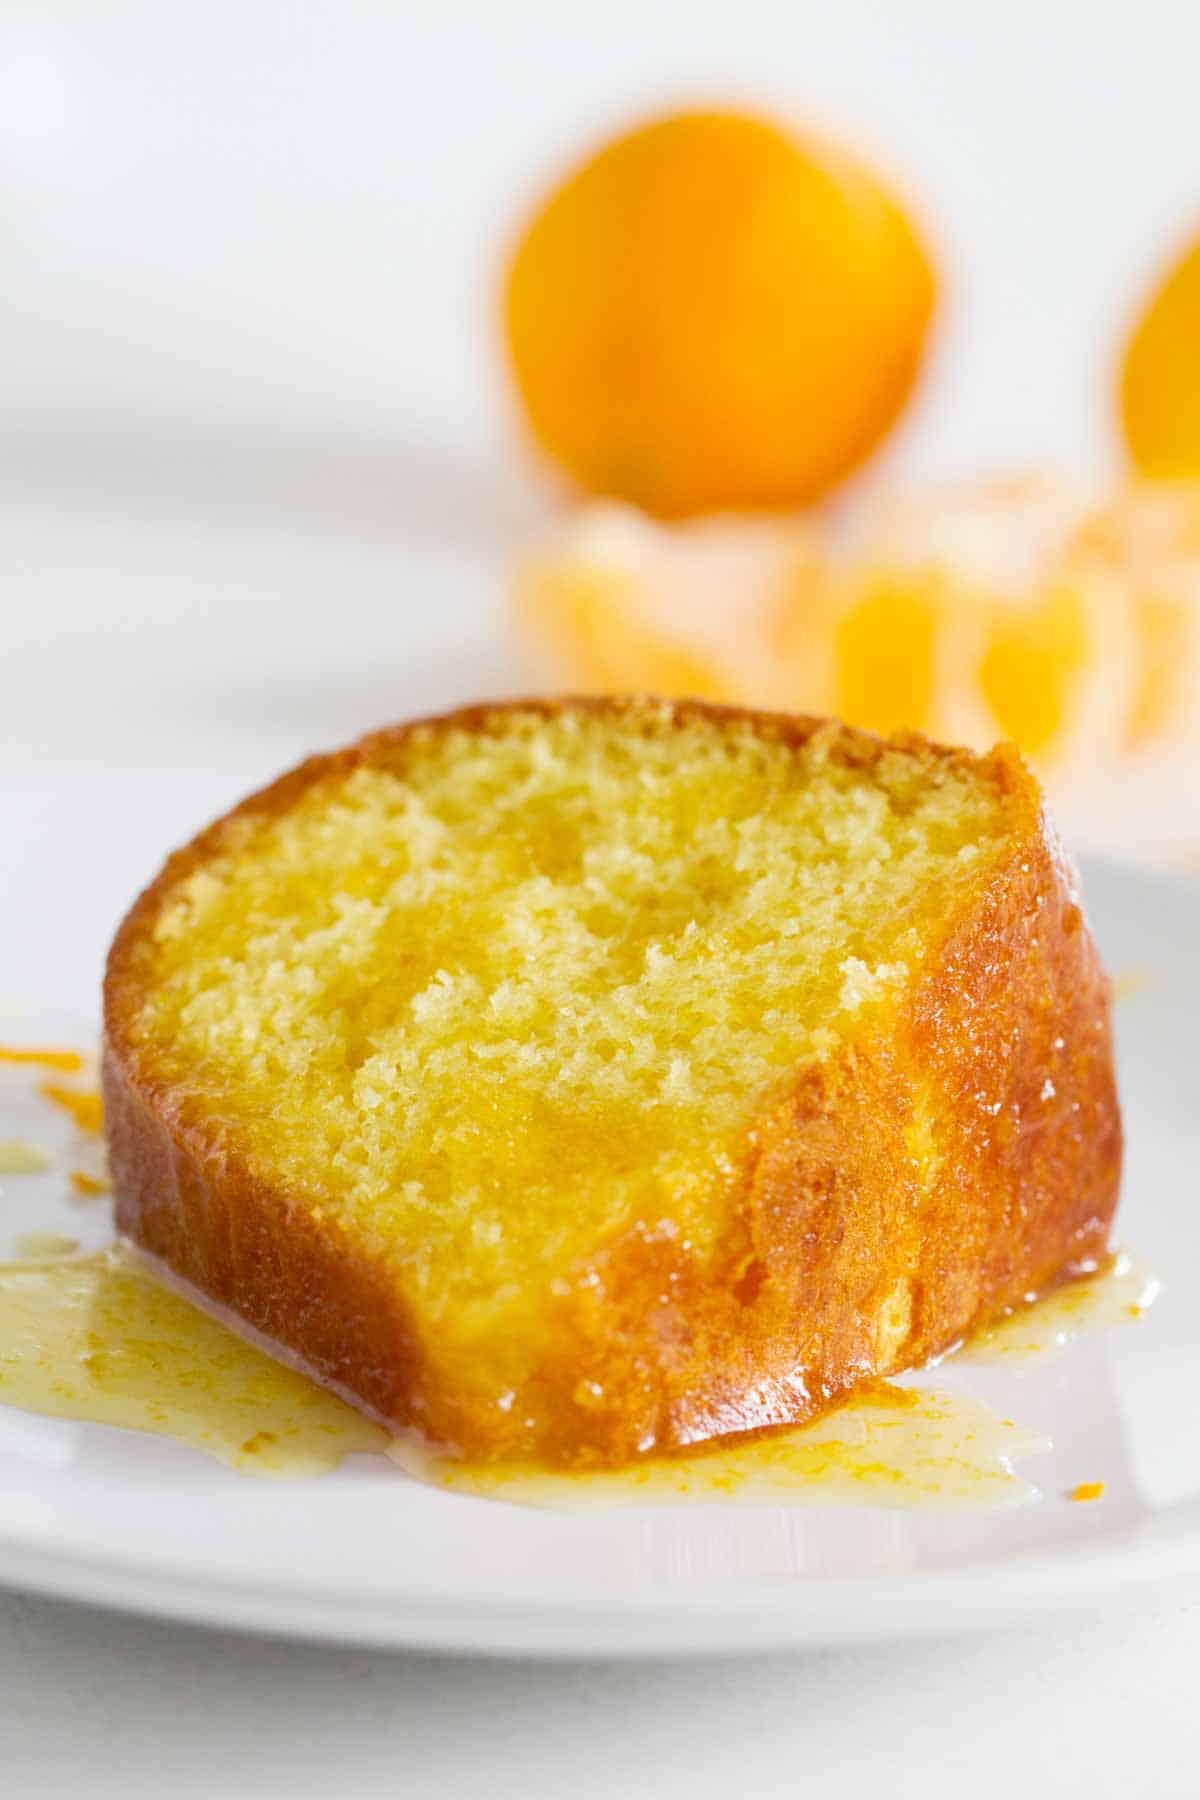 slice of glazed orange bundt cake on a plate